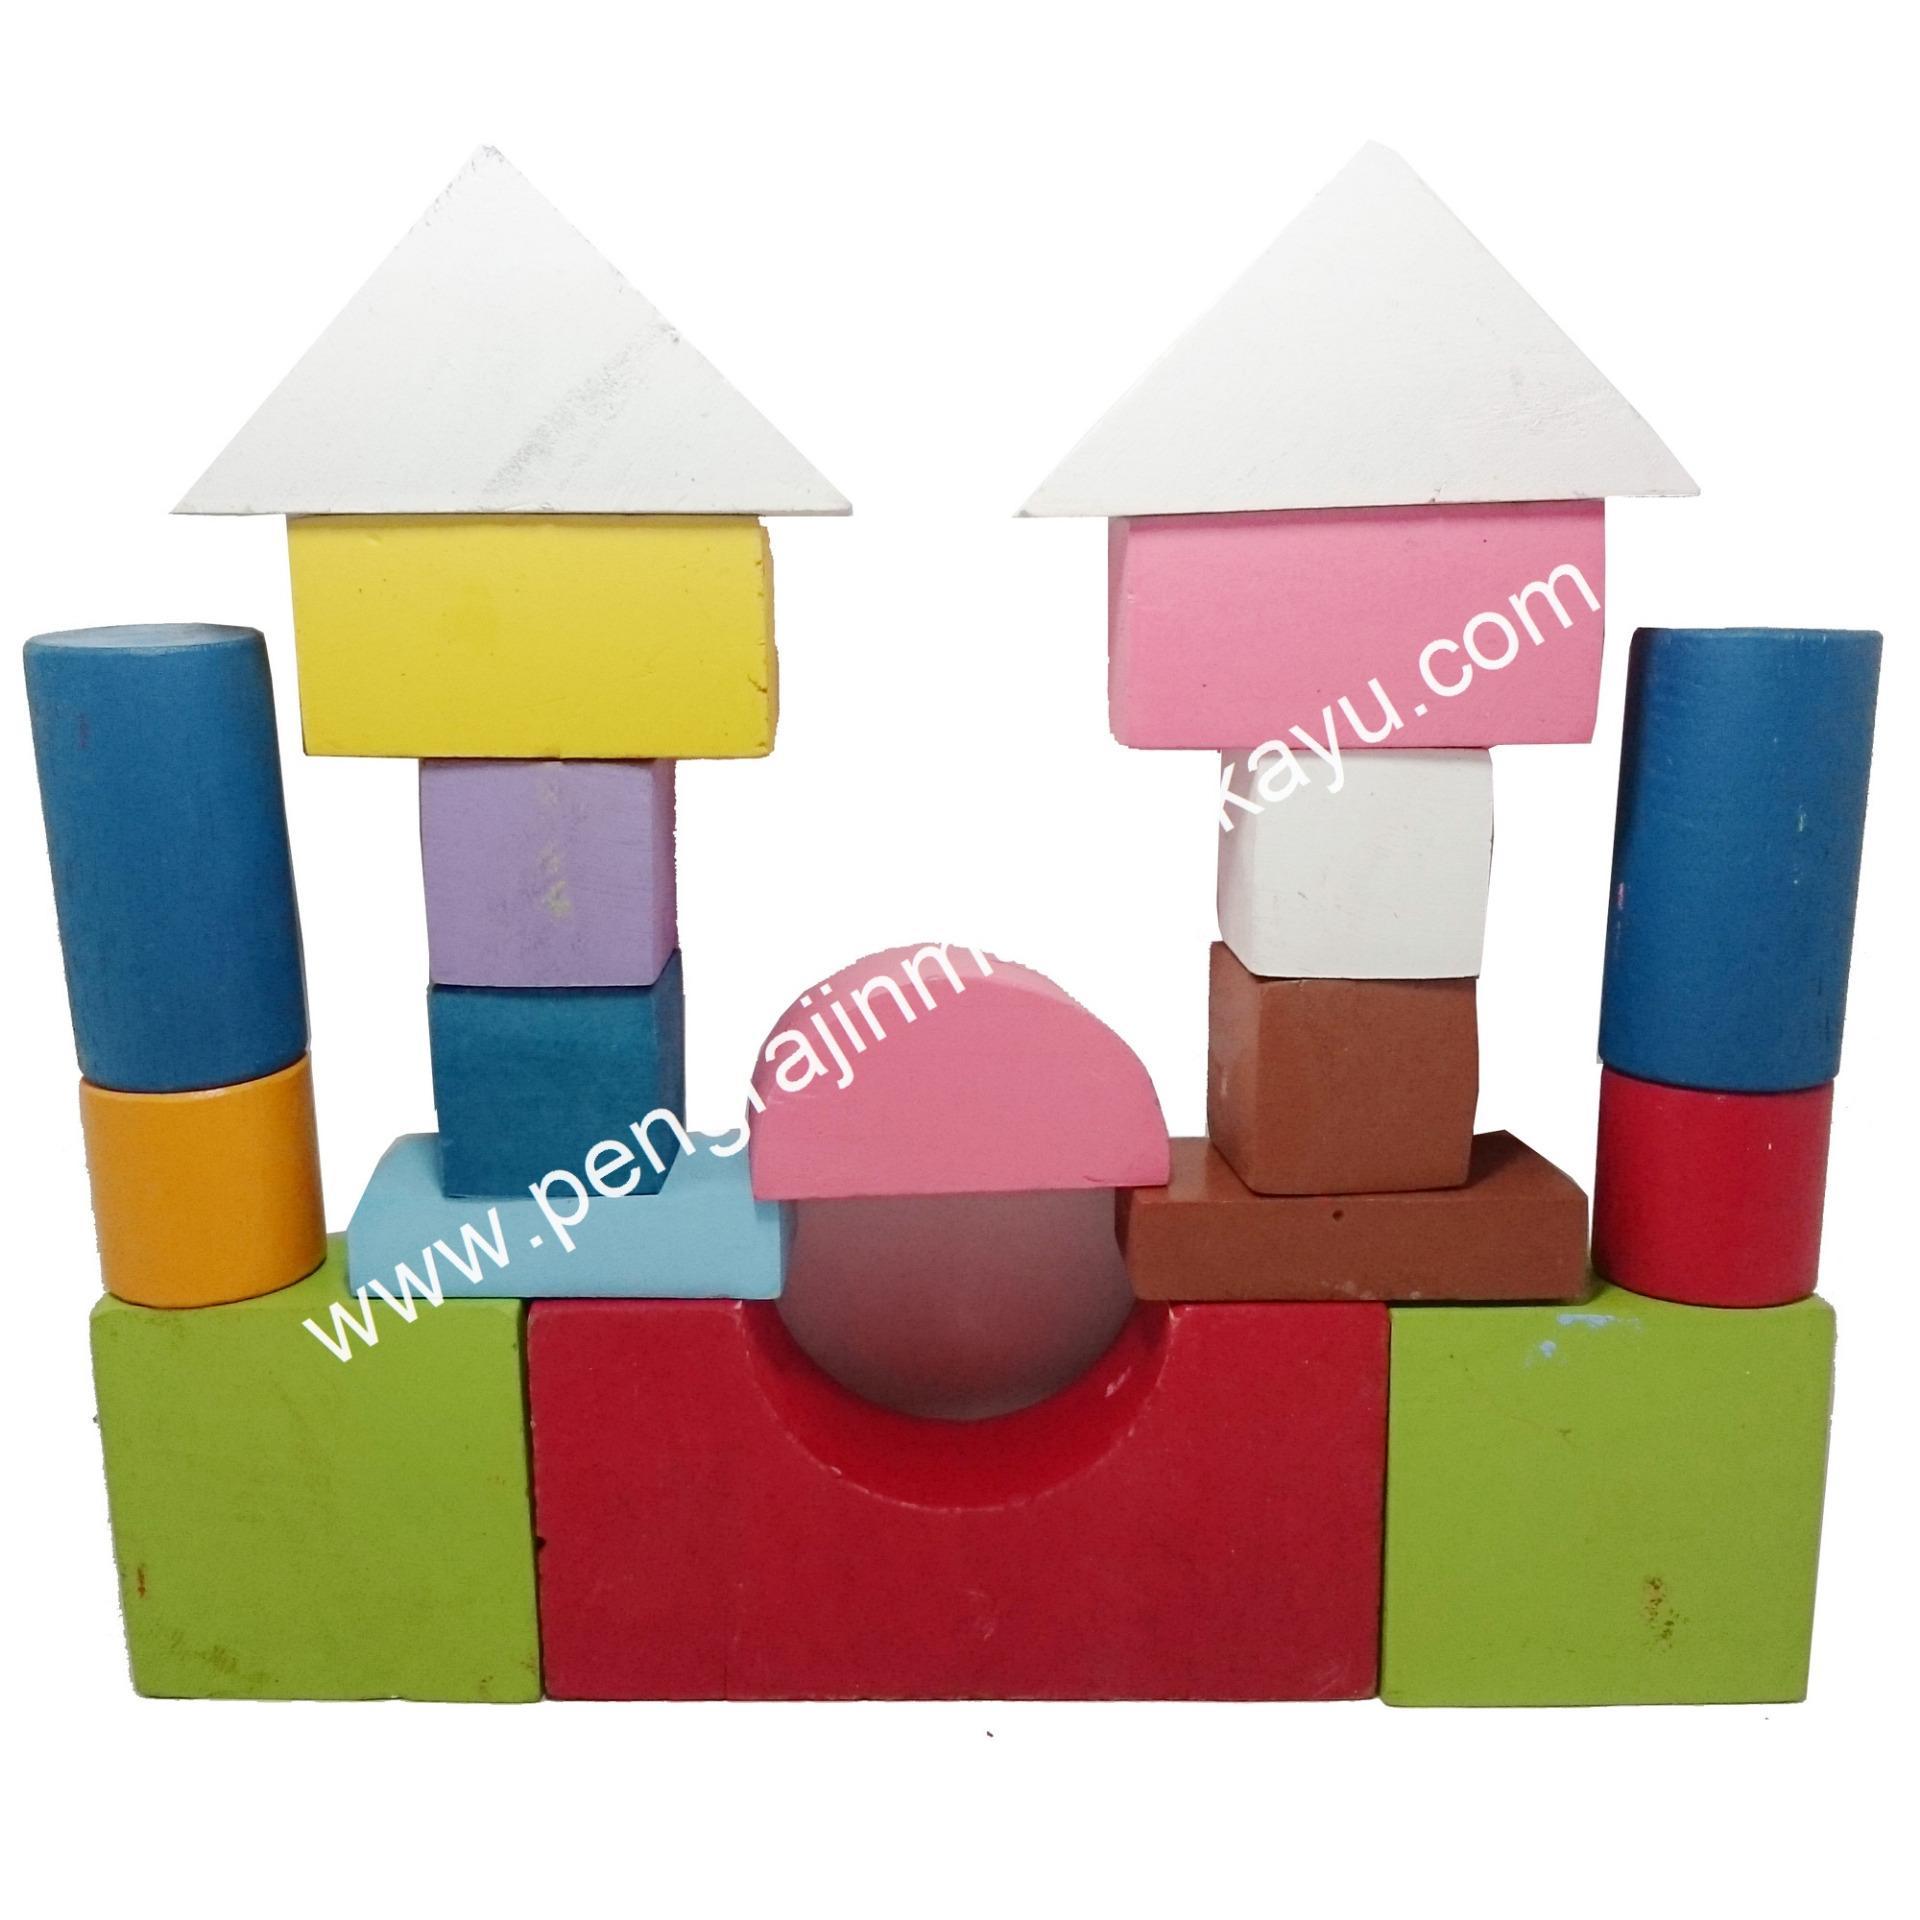 Otoys Mainan Balok Bayi Menyusun Blocks Kretifitas Bola Balita Pa 330196 Fun Character Kreatifitas Edukas Susun Bentuk Warna